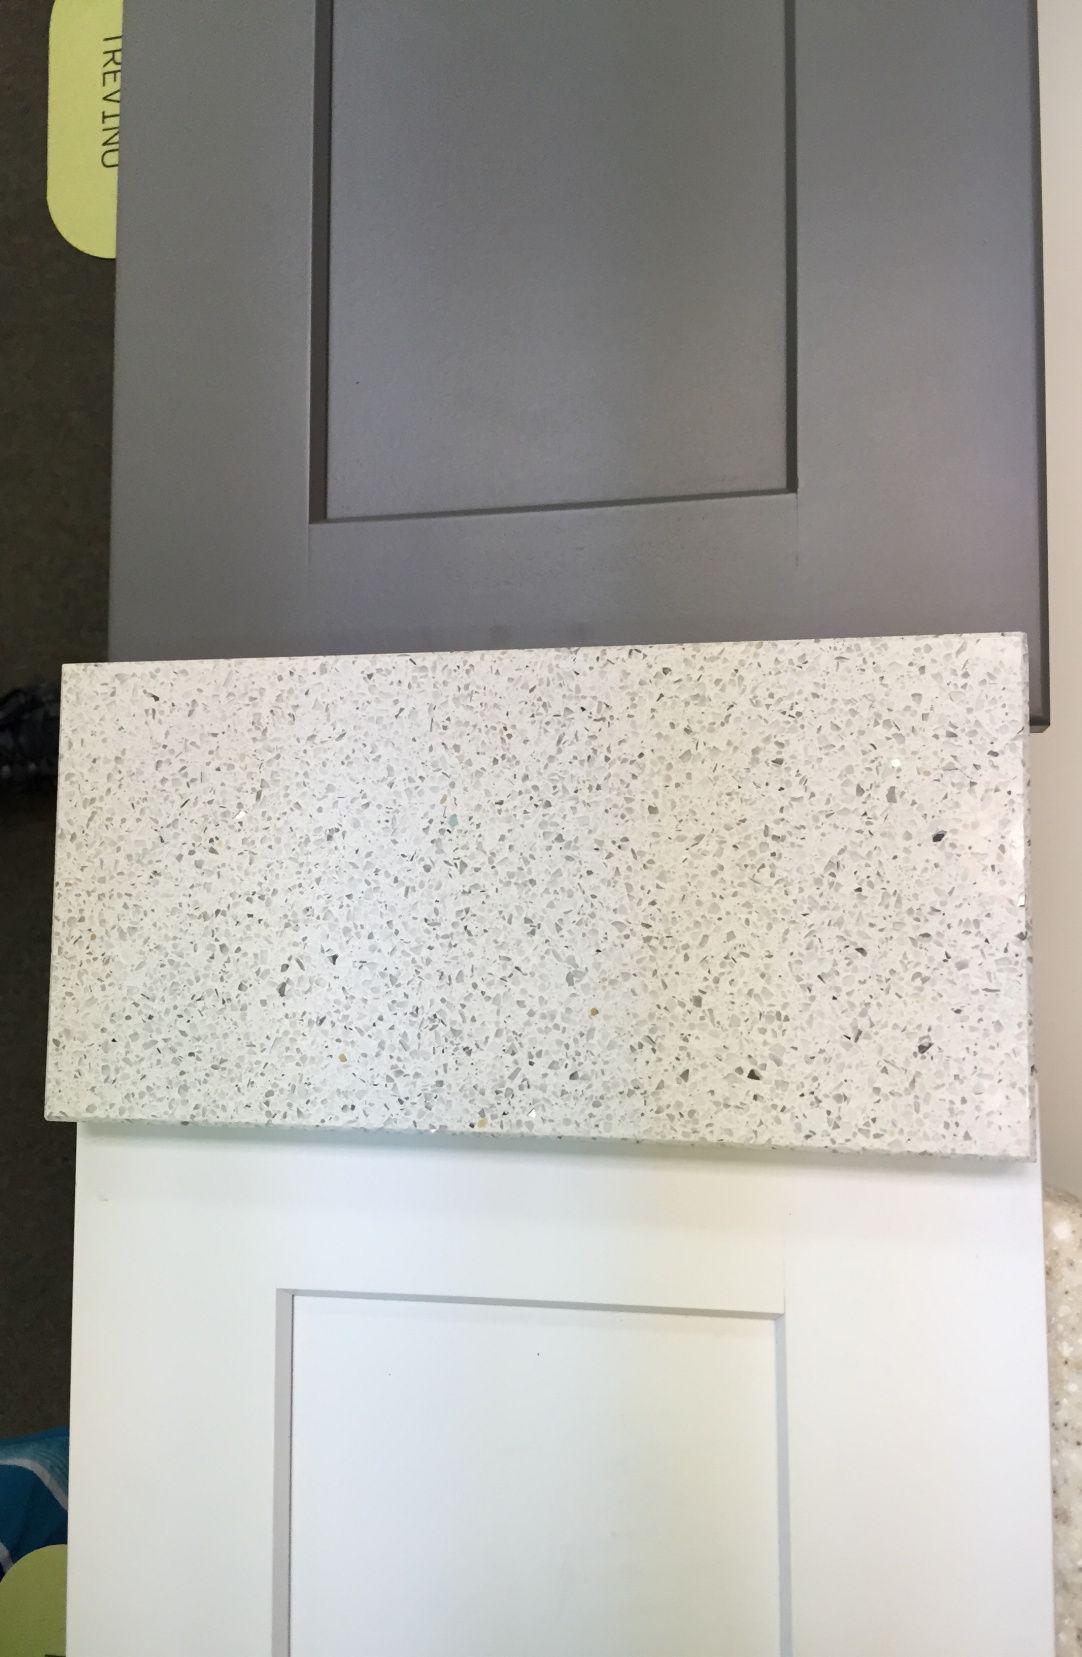 2018 White Speckled Quartz Countertops Chalkboard Ideas For